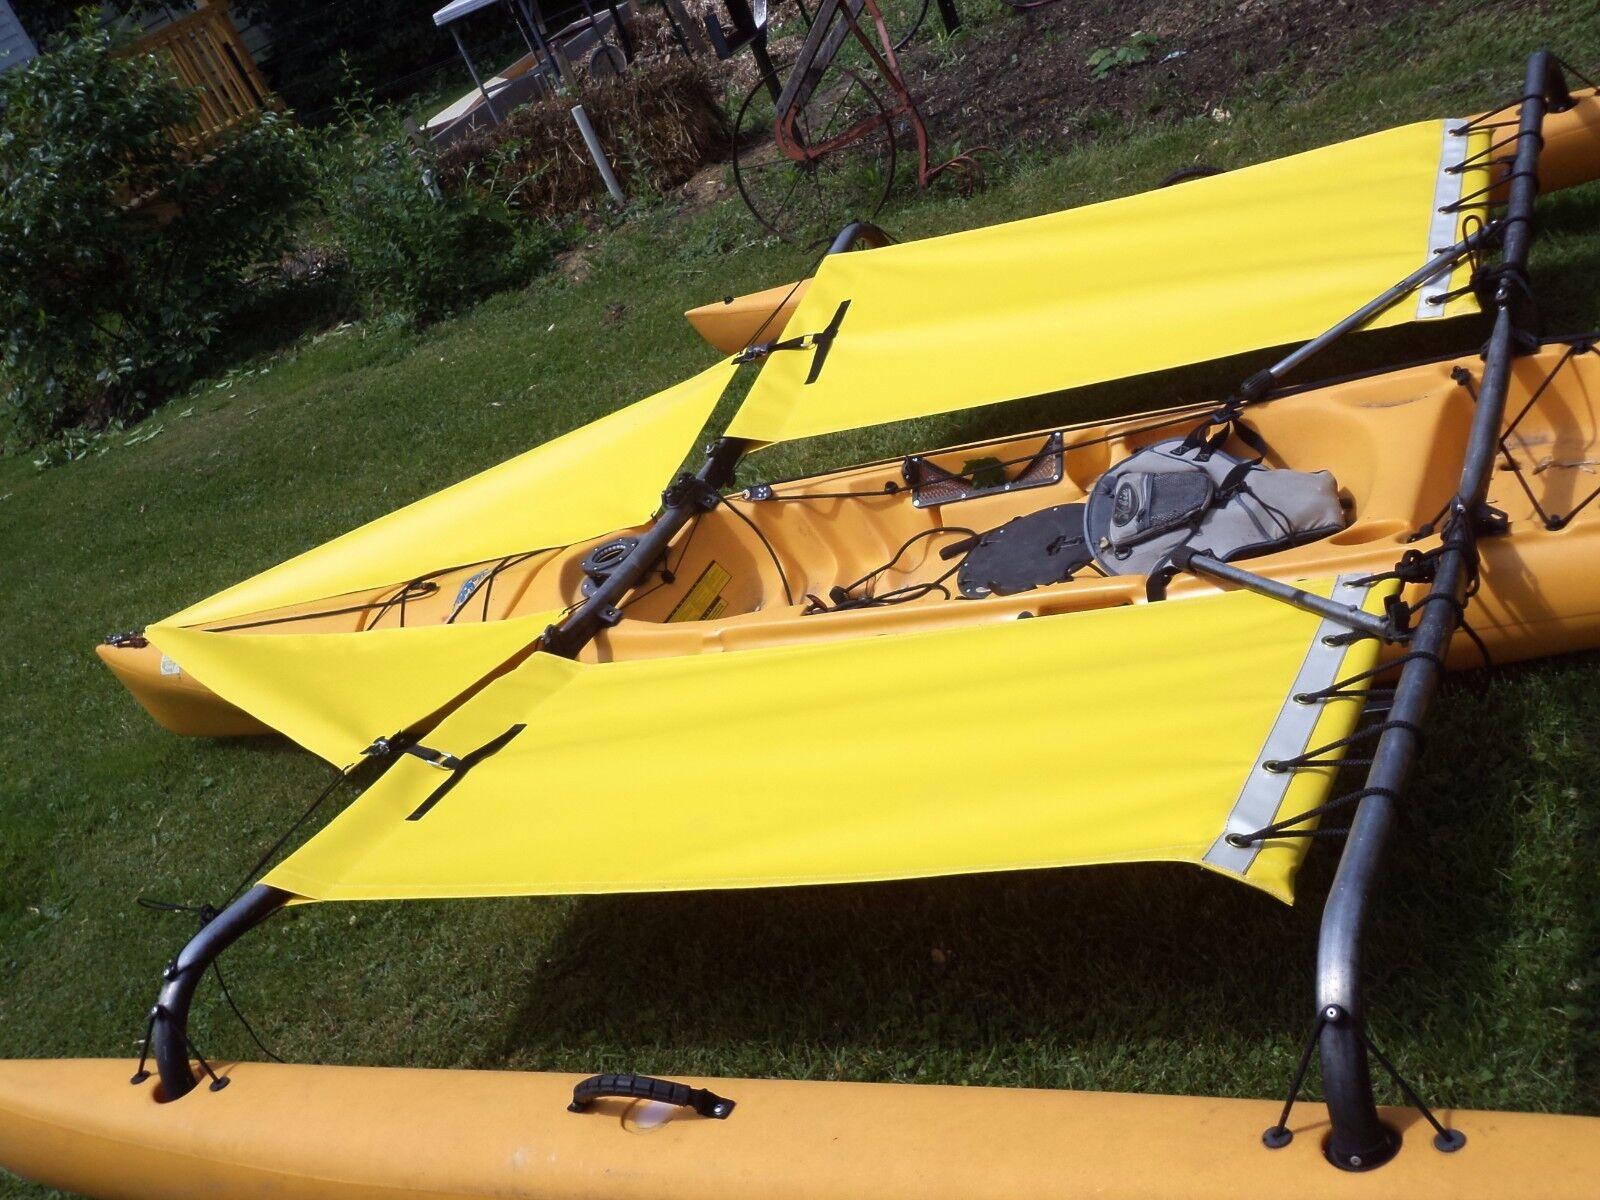 giallo Hobie  Adventure Tandem Kayak Trampoline & splash  shield 2015 and  up